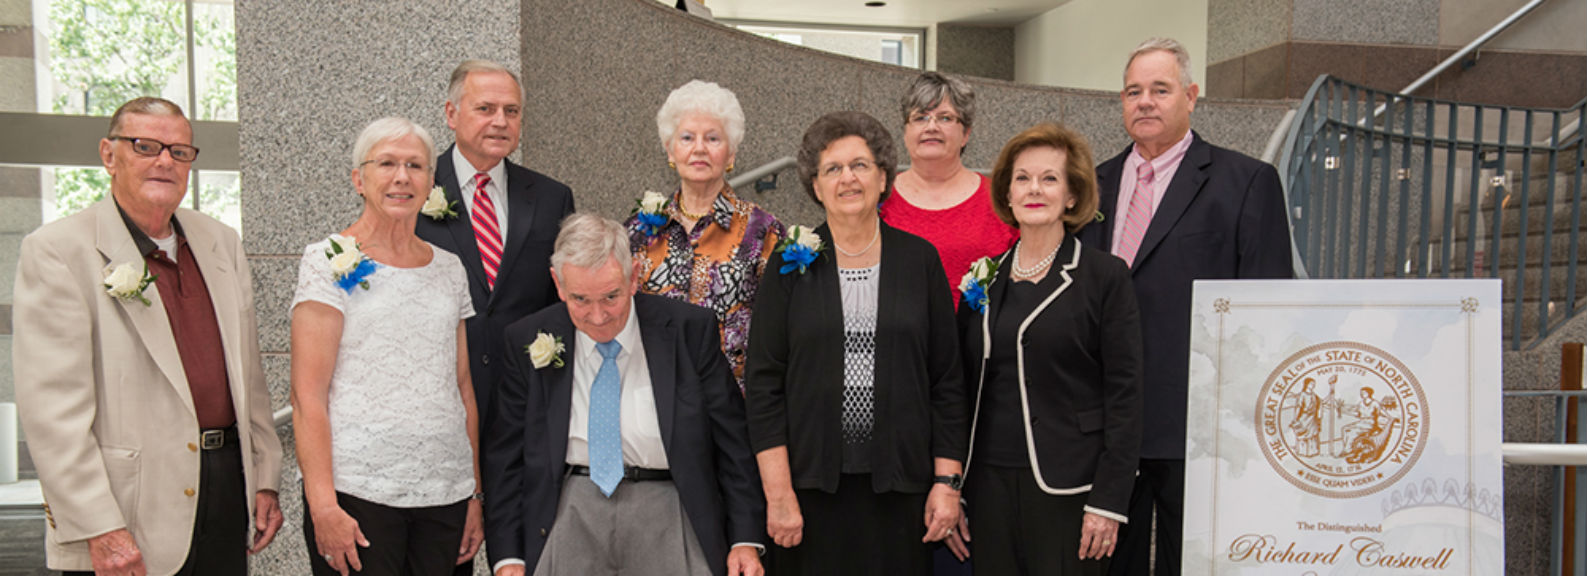 Cabarrus County | North Carolina Judicial Branch